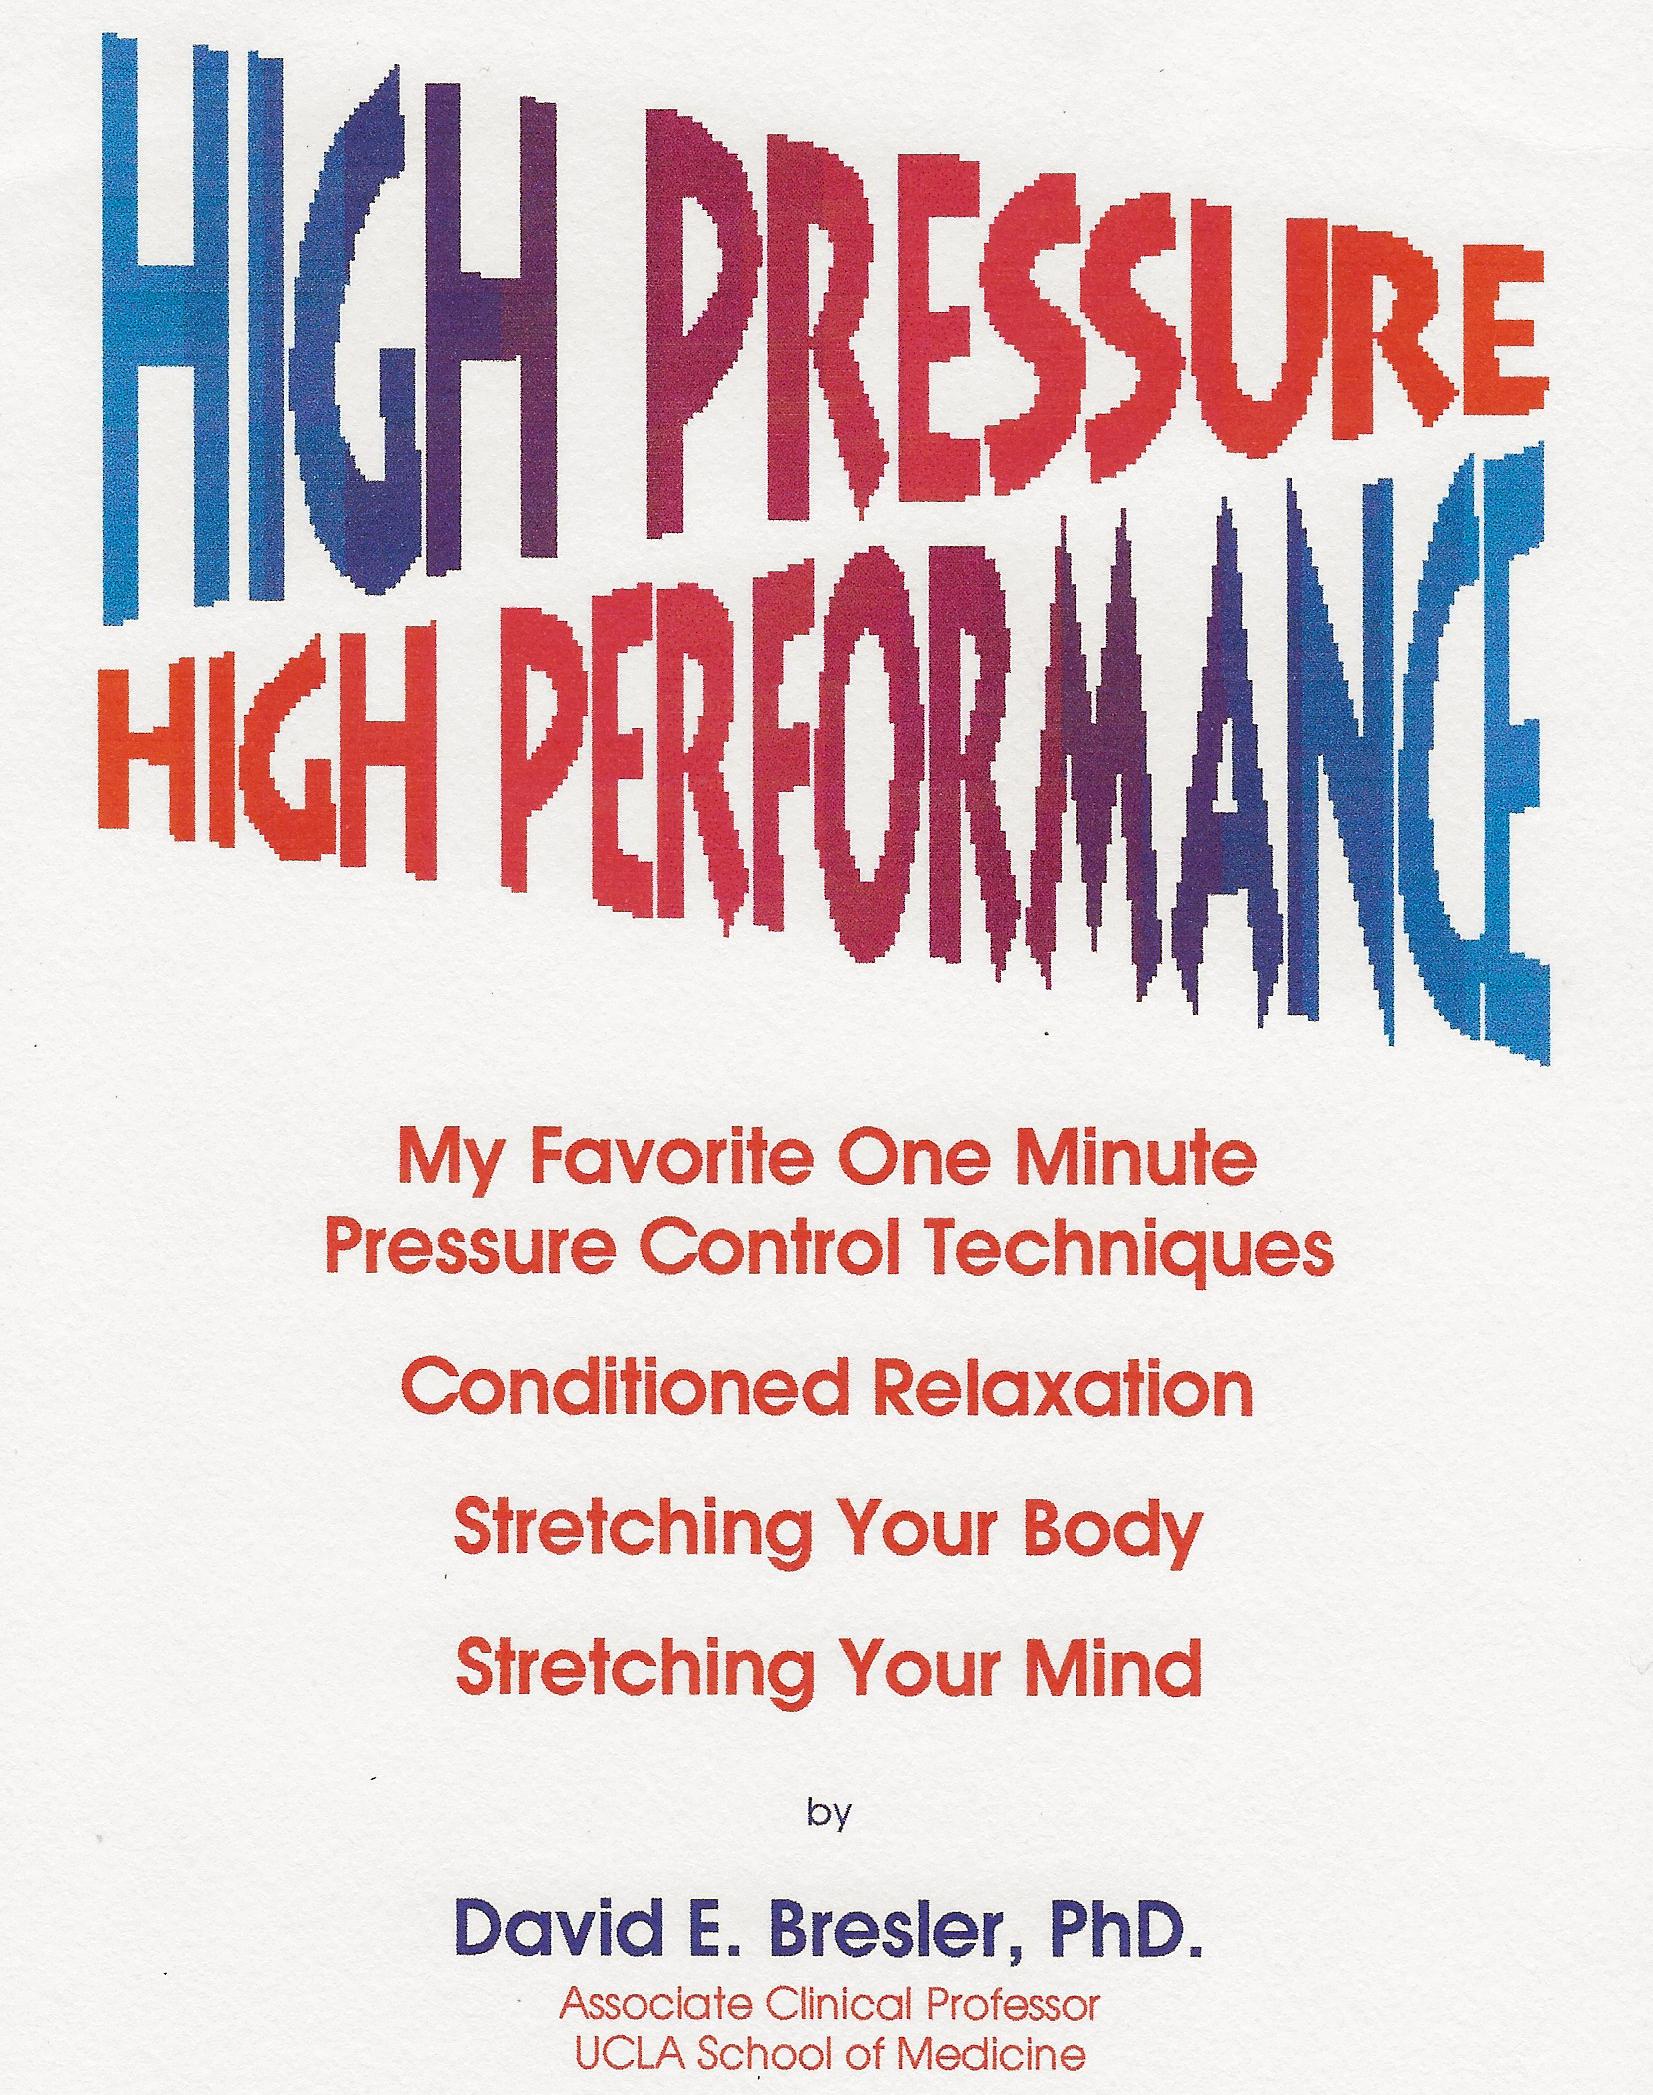 High Pressure High Performance